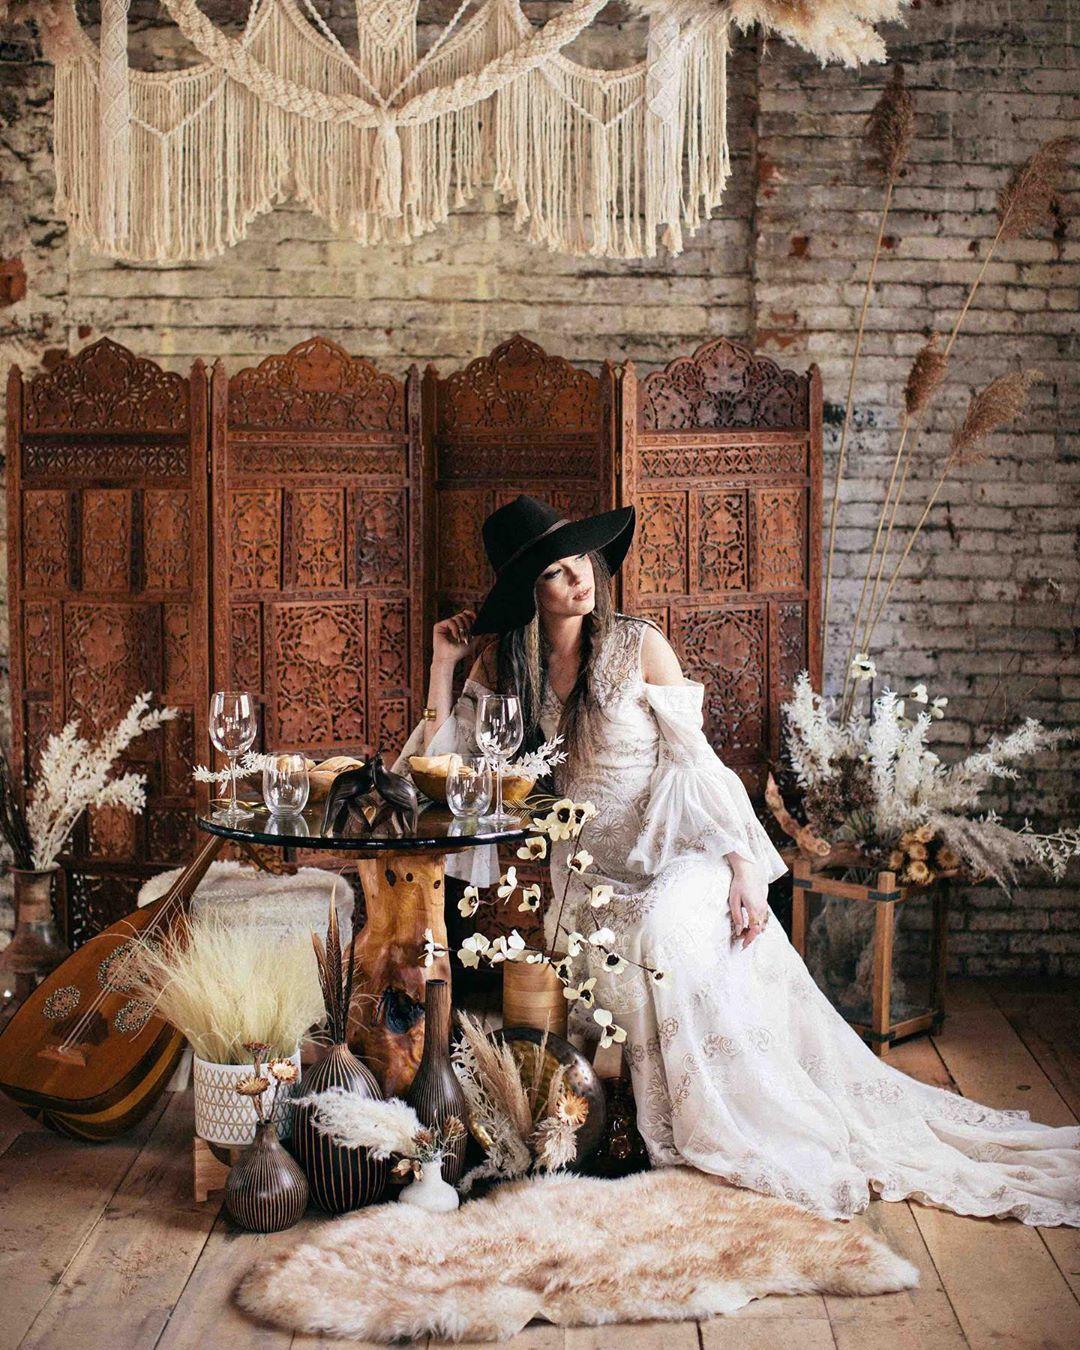 {gypsy• goddess} . . photo & design| @kate_preftakes  florals & design| @lotusfloraldesigns  cake/food & design| @autumnnomad  stationary | @amrcalligraphy  jewelry | @heartofgolddesigns  macrame | @rissa.bee  hair | @jeffreypiroso  makeup| @kmac__beauty  model | @thefreckledmodel  dress | @pamela_moore_bridals . . #gypsy #macrame #warmtones #boho #bohobride #bohochic #gotstyle #cozy #interesting #unique #weddinginspo #love #lotusfloraldesigns #getcreative #portrait